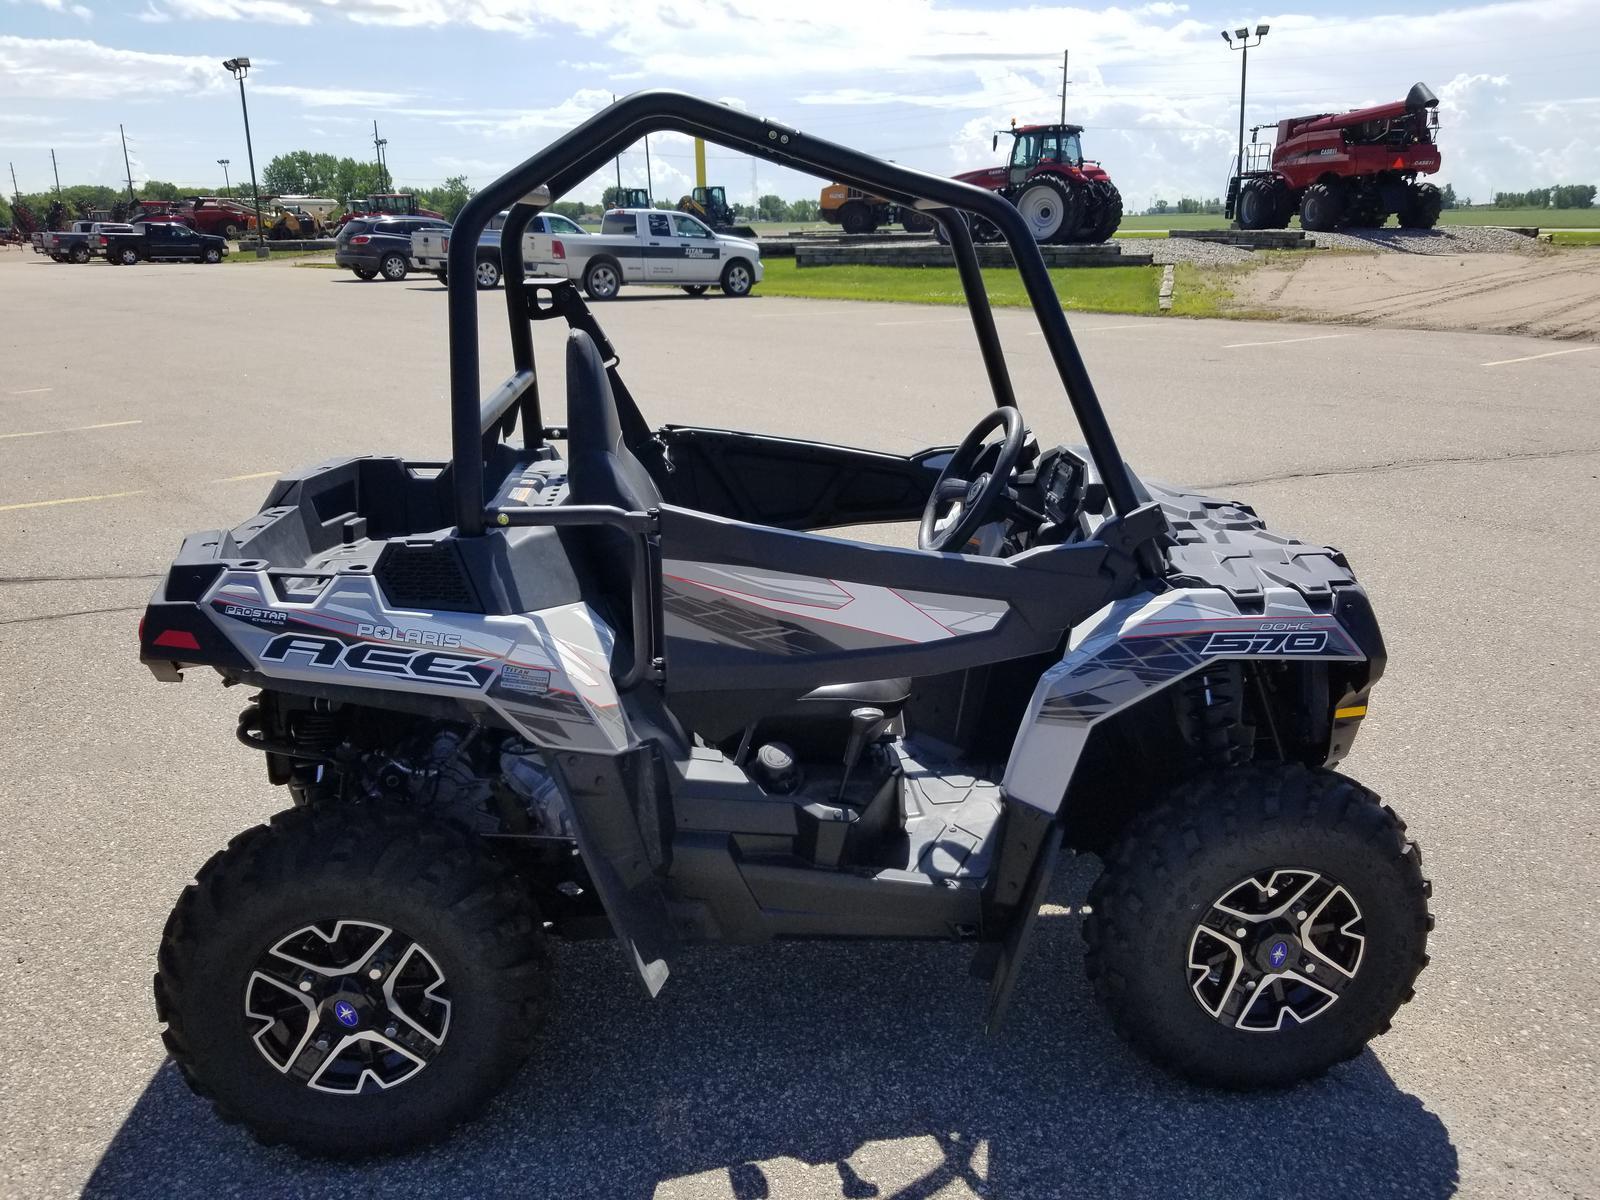 Inventory Titan Machinery Crookston, MN (800) 552-4668